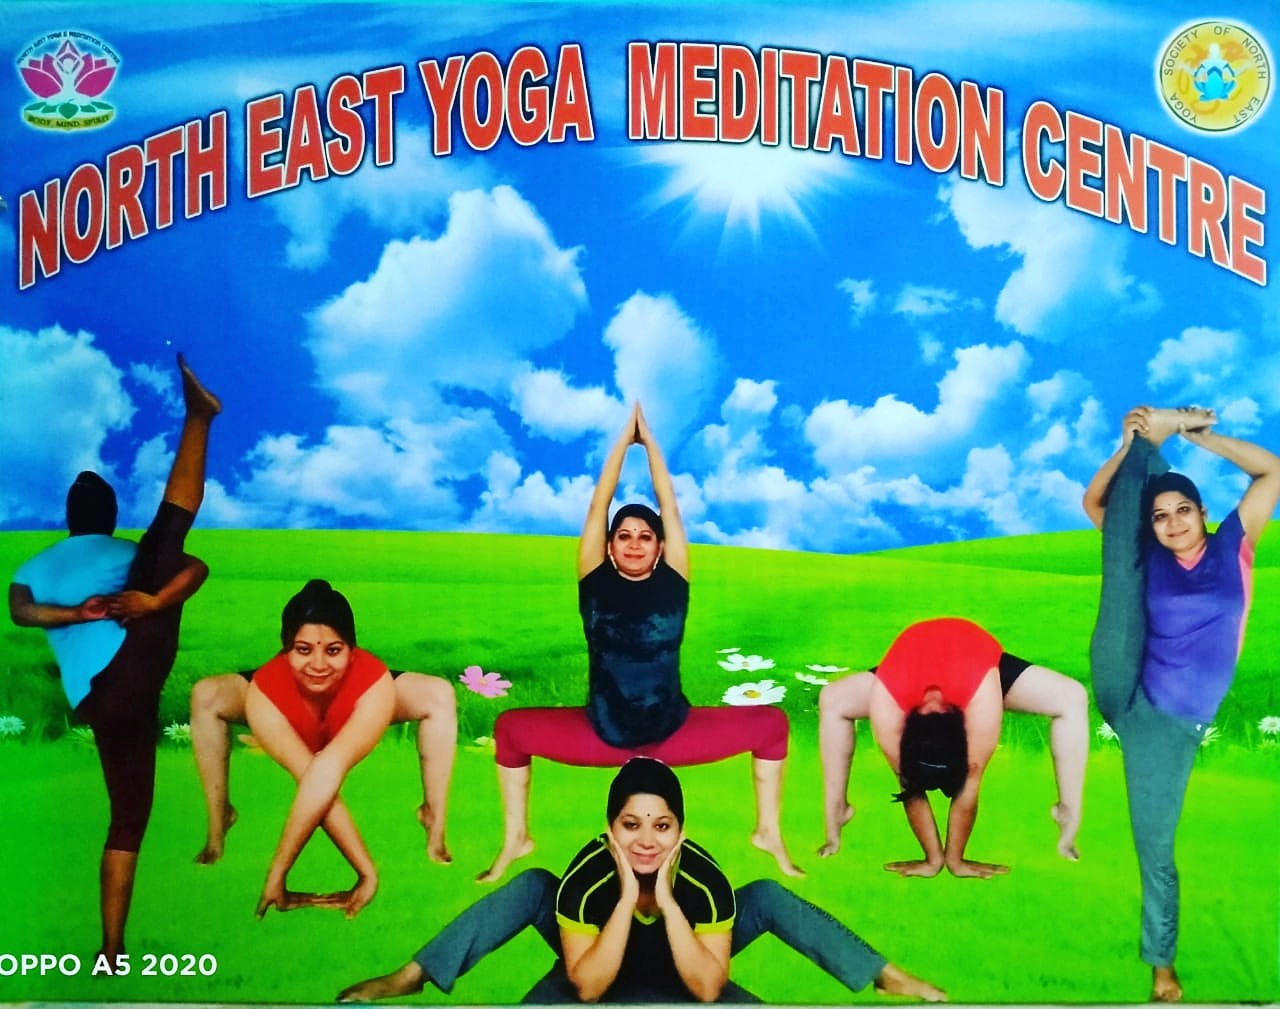 North East Yoga Meditation Centre